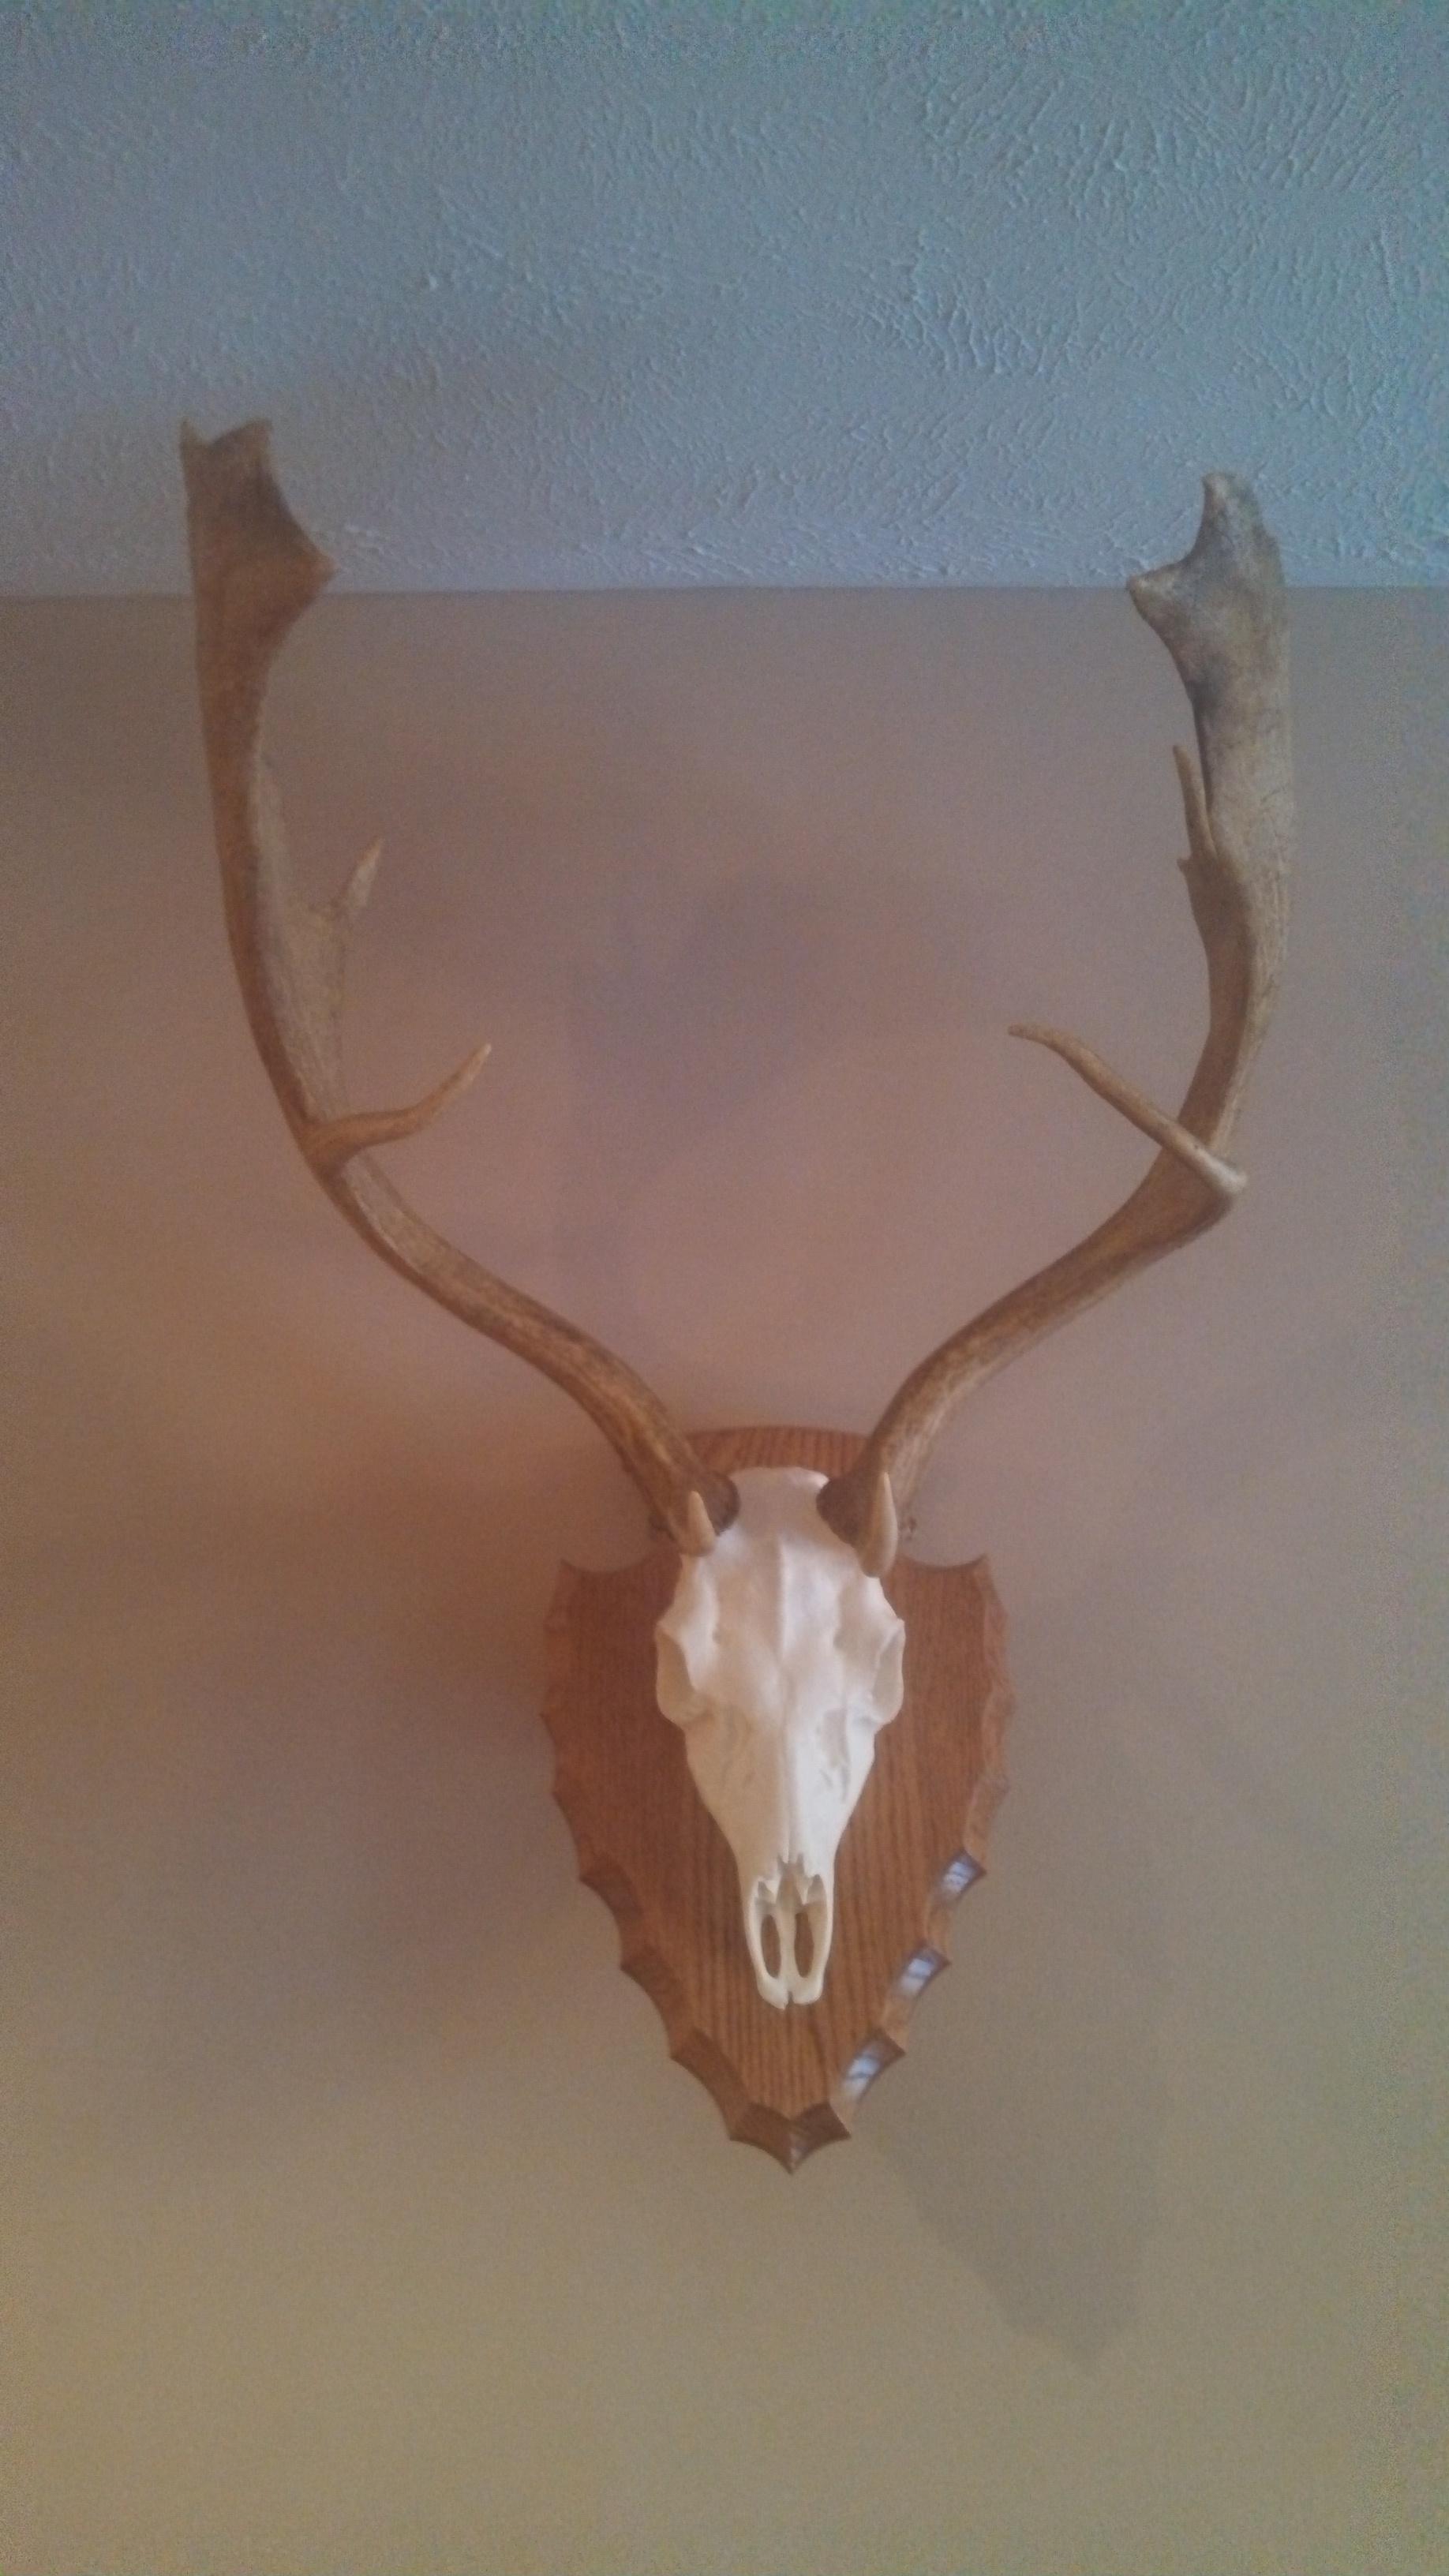 Fallow deer shed antlers